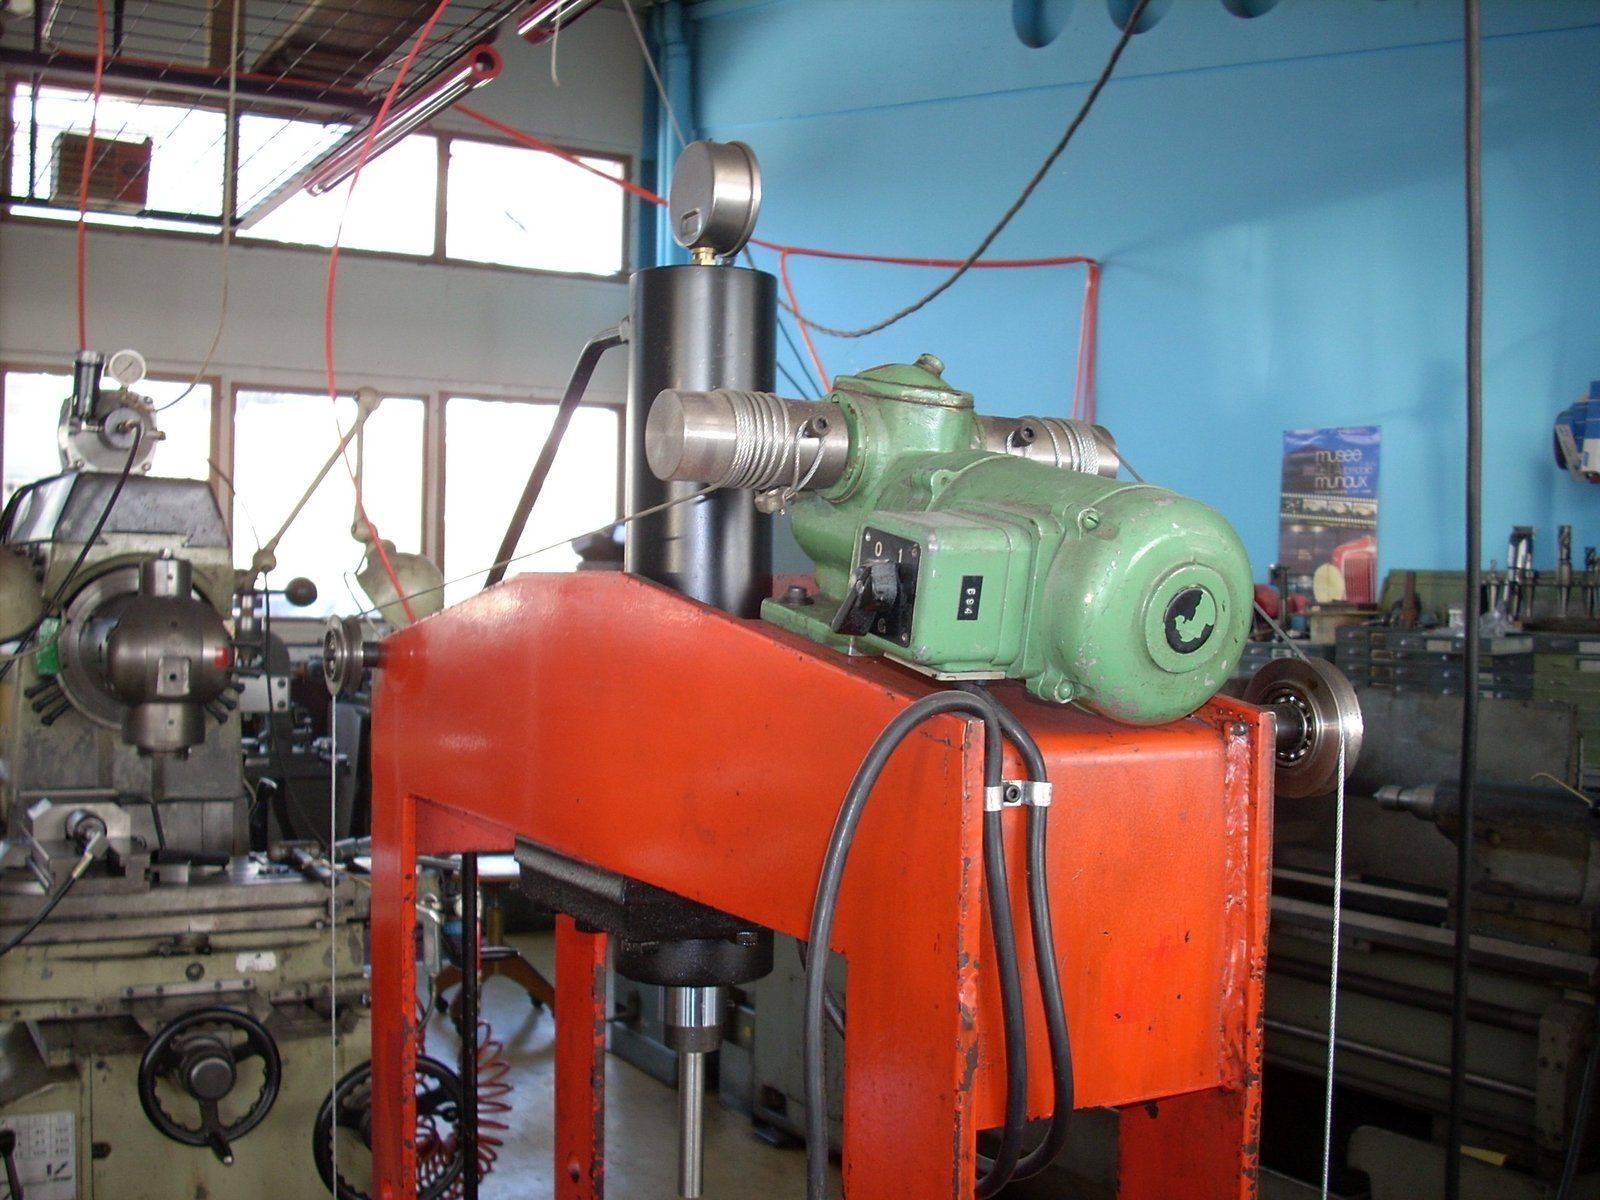 Presse 15 tonnes 003.JPG